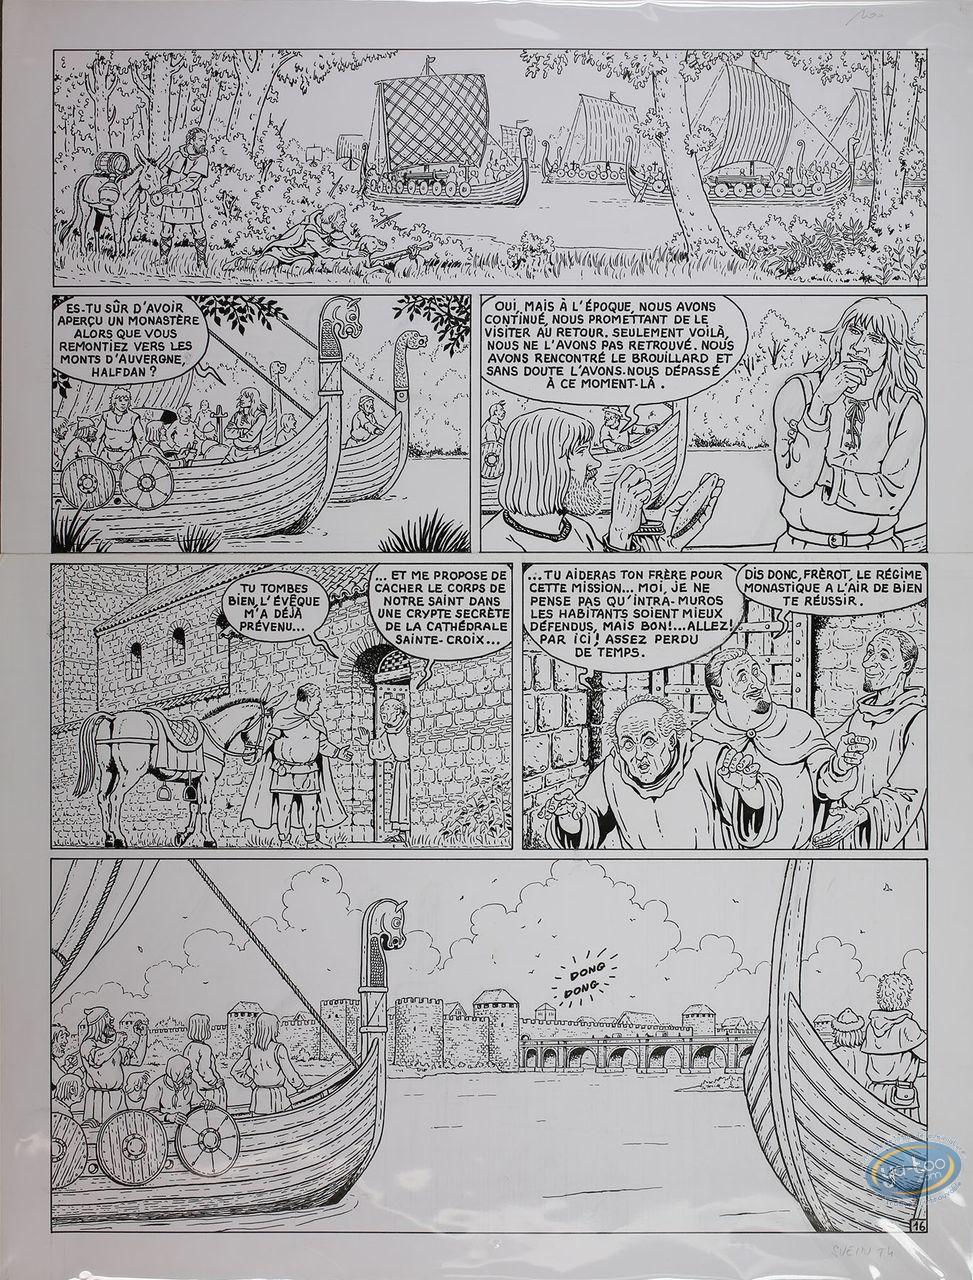 Originaux, Svein : Moi, Svein, compagnon d' Hasting, Planche 16